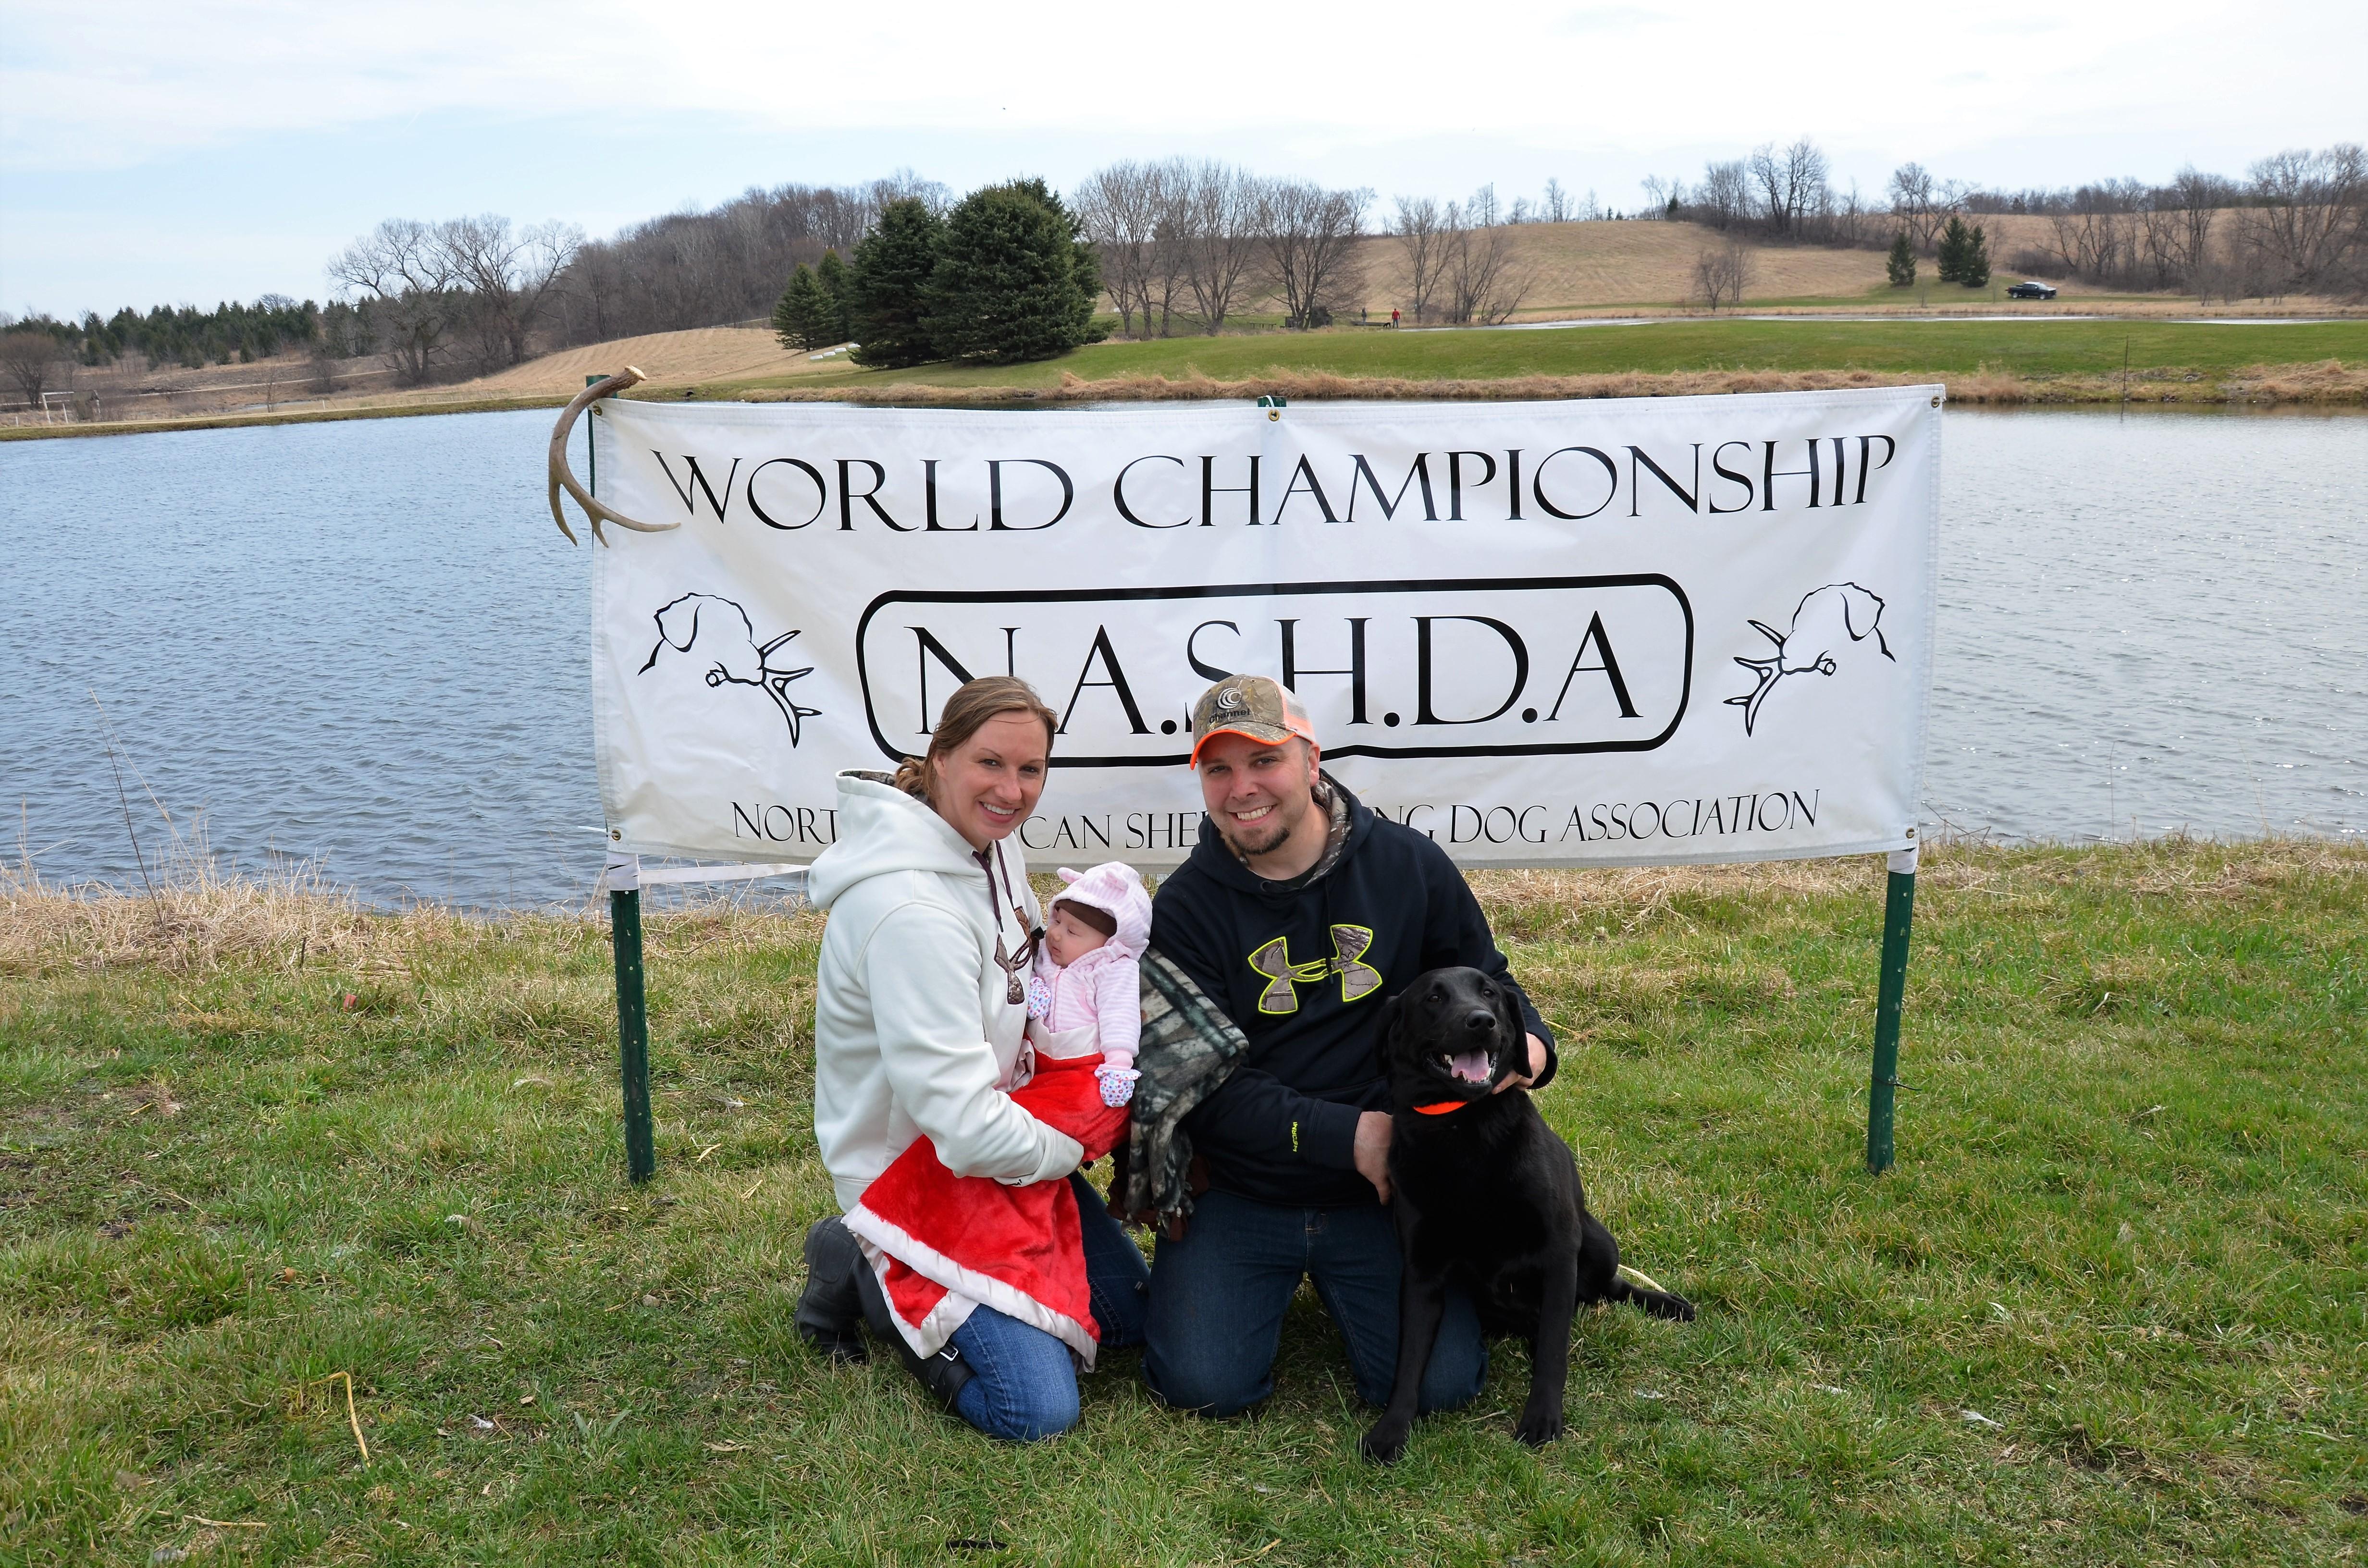 2017 NASHDA World Championship